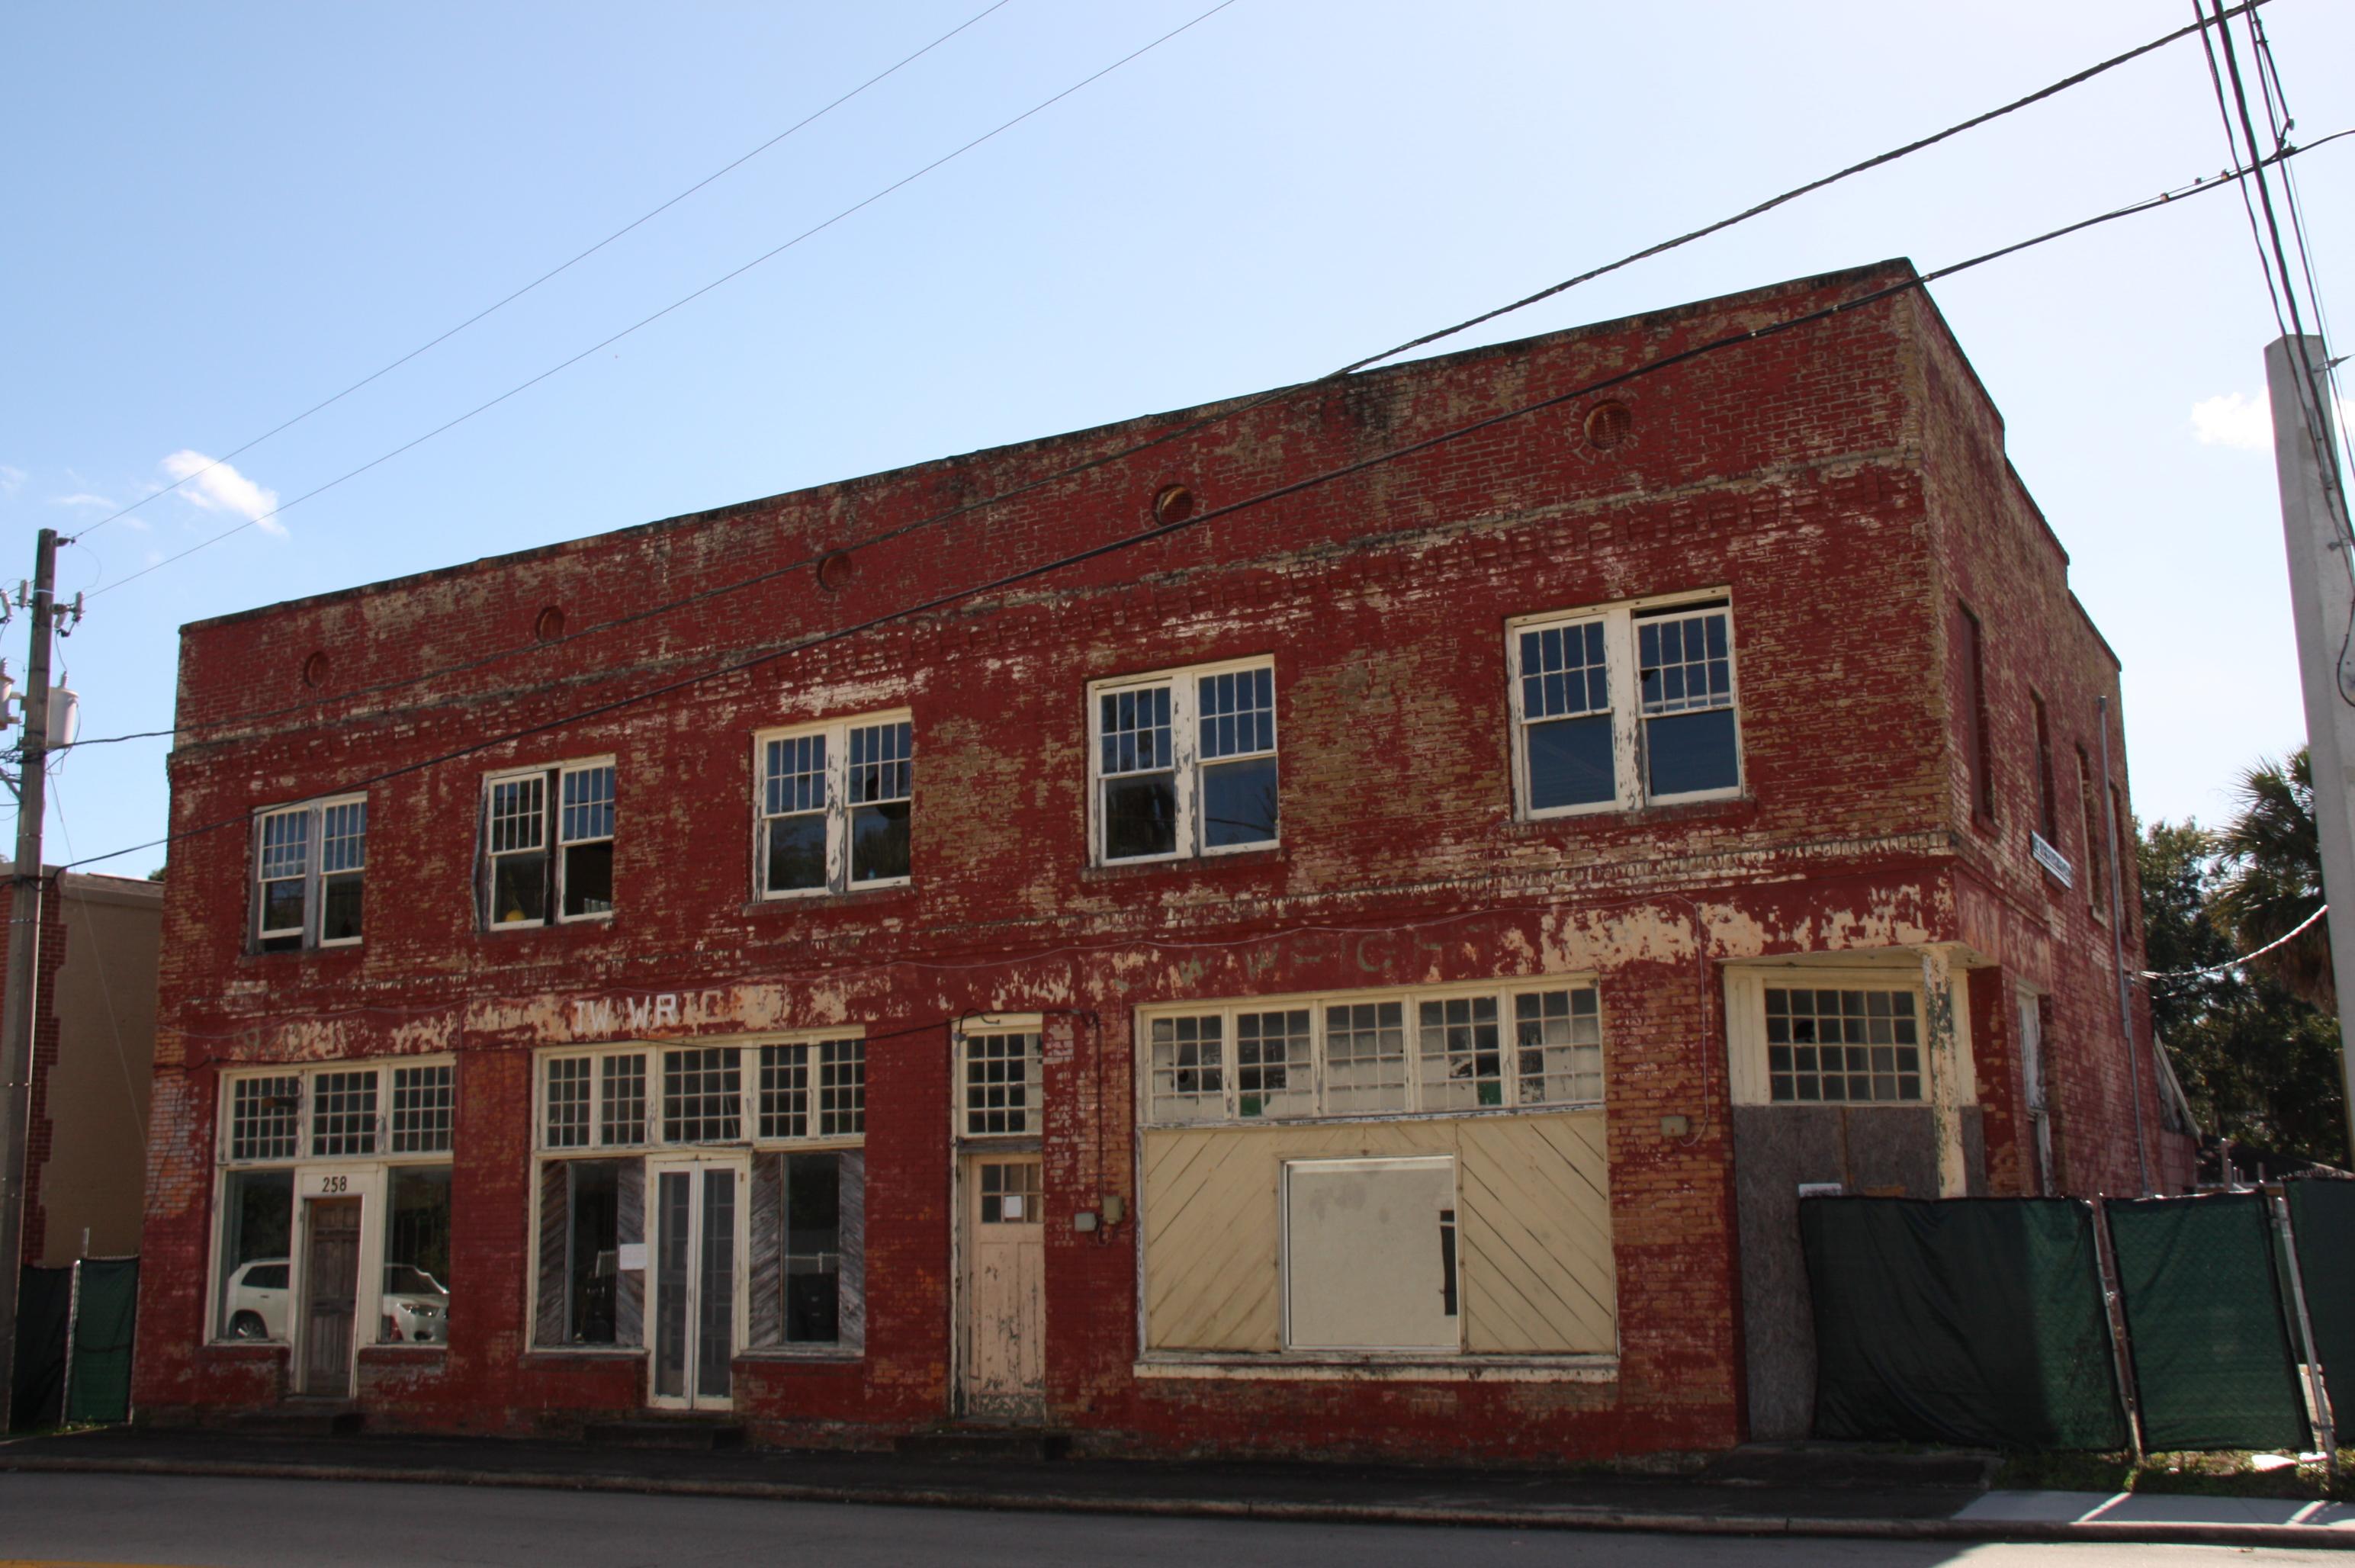 James W. Wright Building